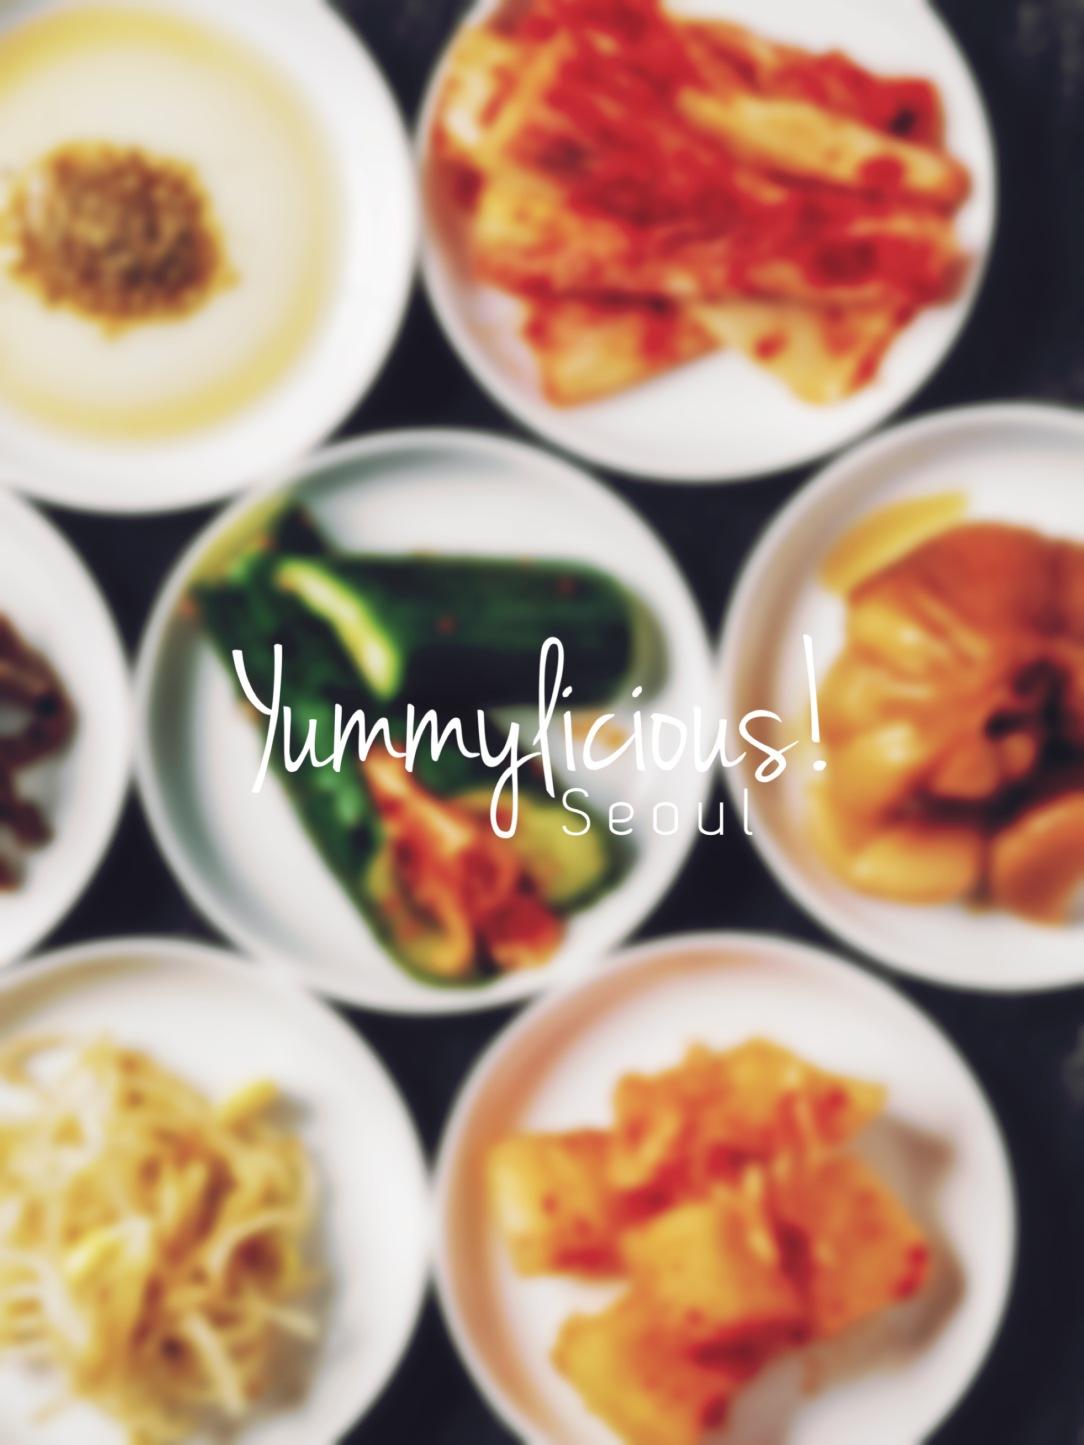 #71 Yummylicious! Seoul! Cover.jpg